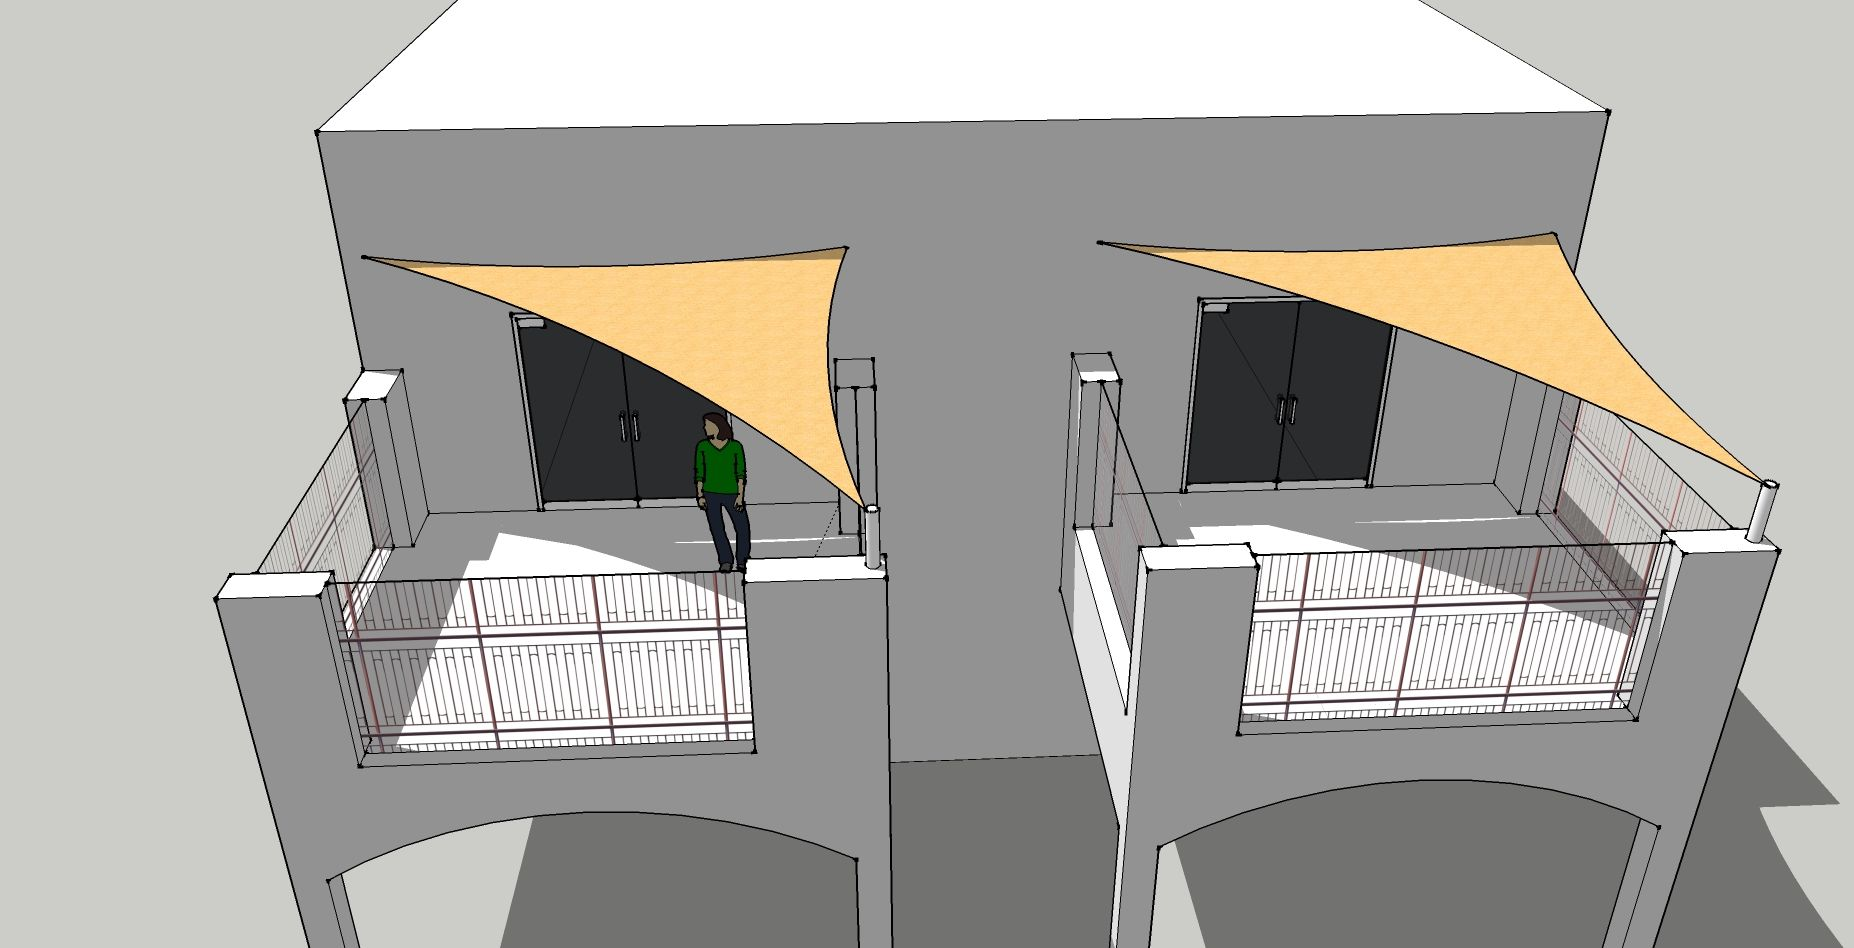 voiles d 39 ombrage sur balcon de condos triangulaires. Black Bedroom Furniture Sets. Home Design Ideas